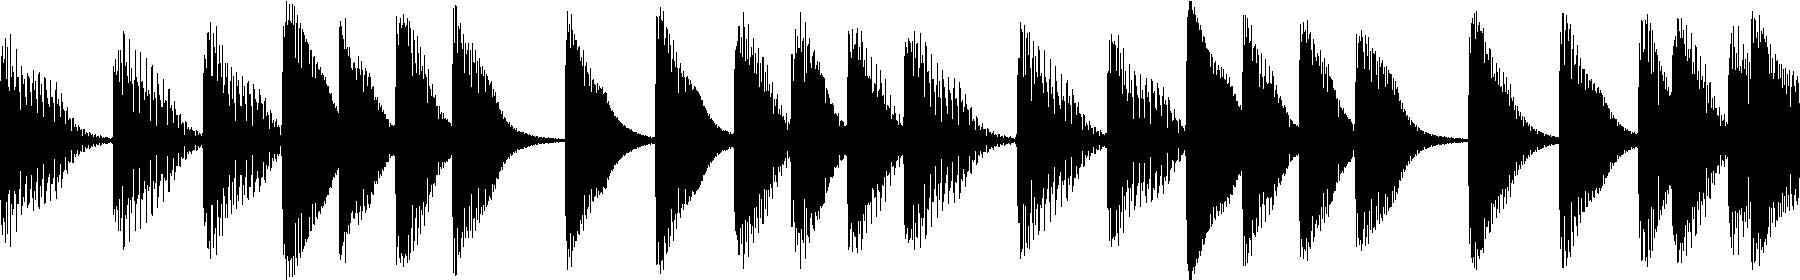 vedh melodyloop 092 em 122bpm